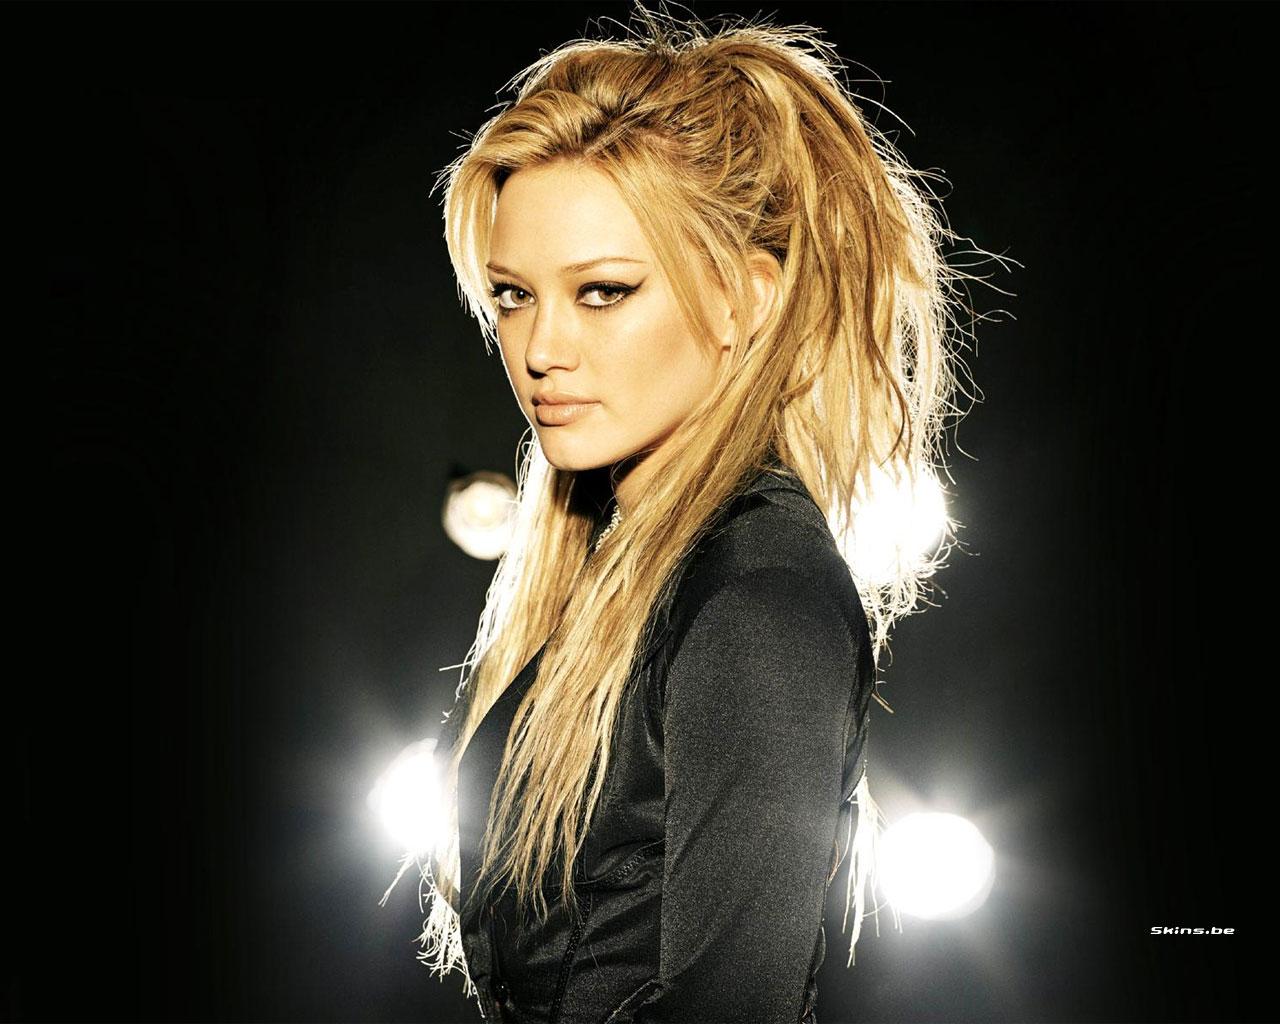 Hilary - Hilary Duff W... Hilary Duff